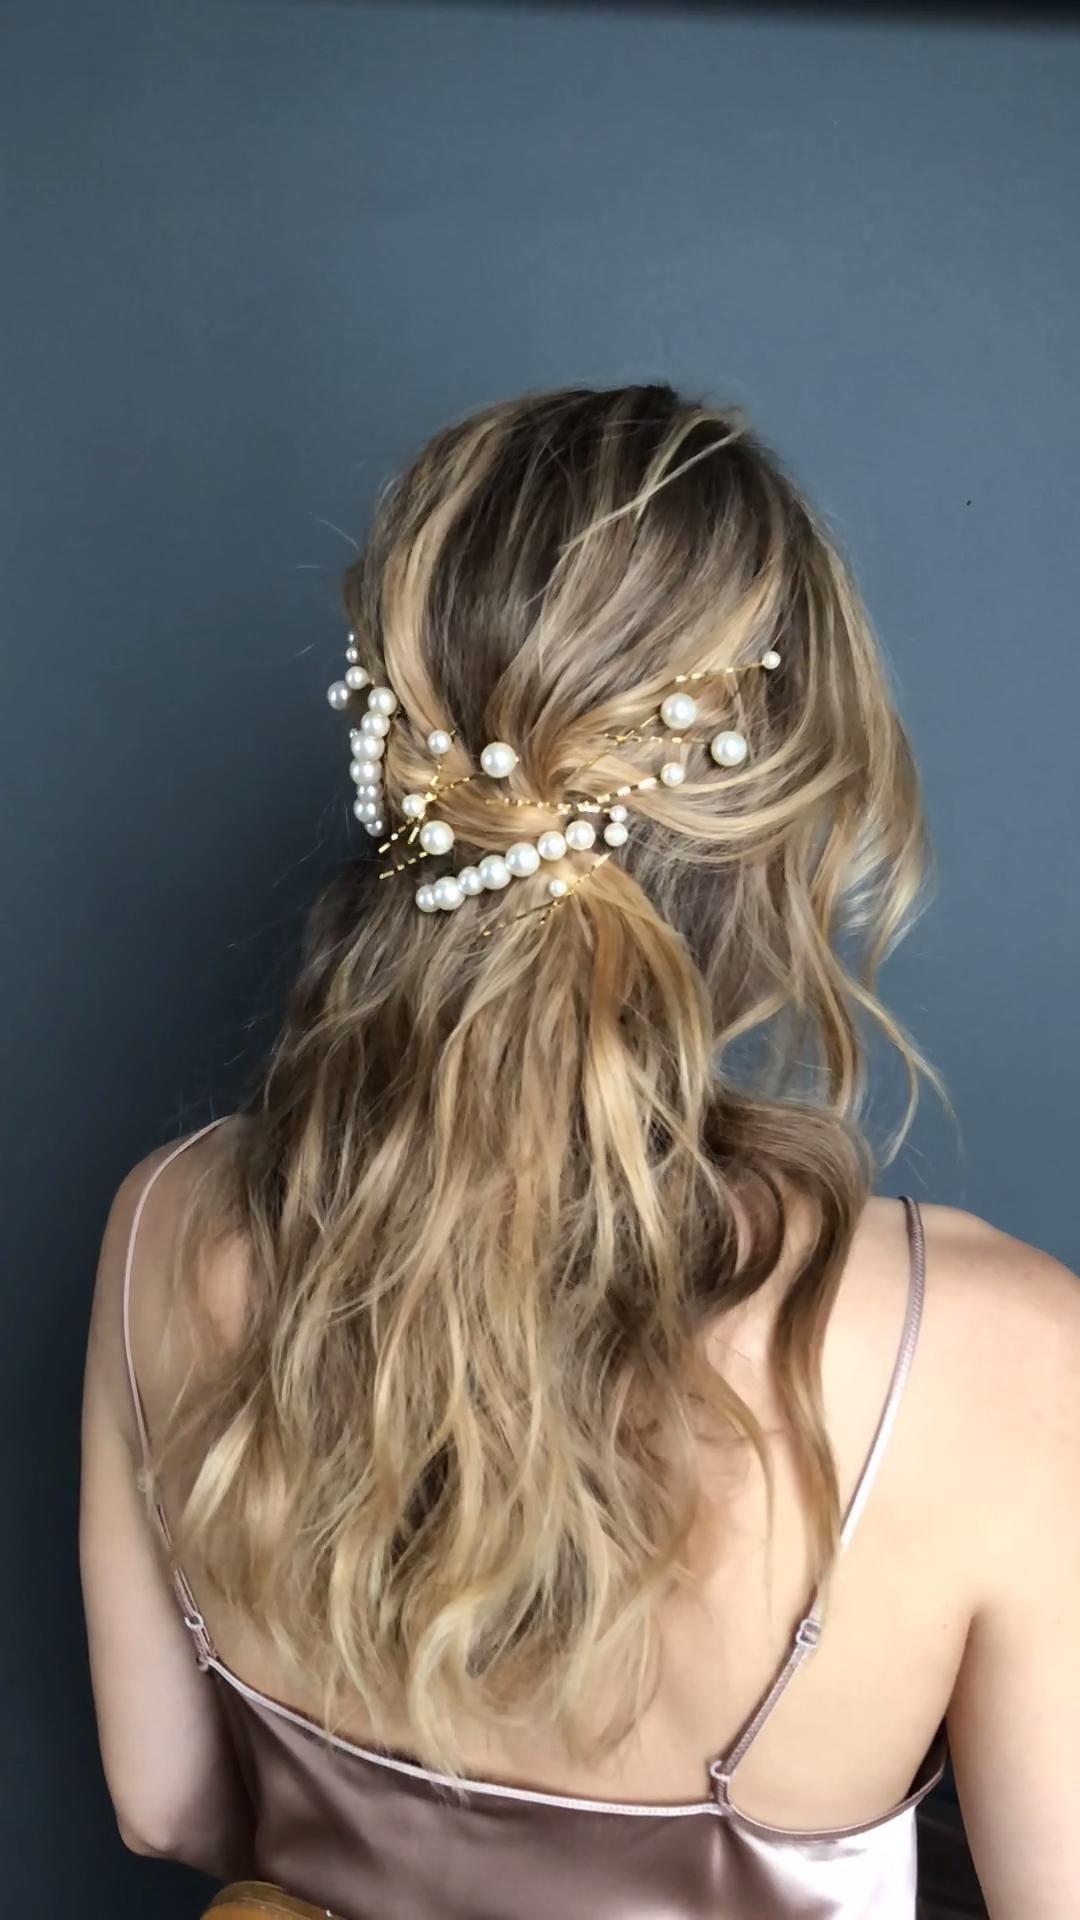 DIY hair: pearls on pearls! -   16 hair Half Up Half Down homecoming ideas